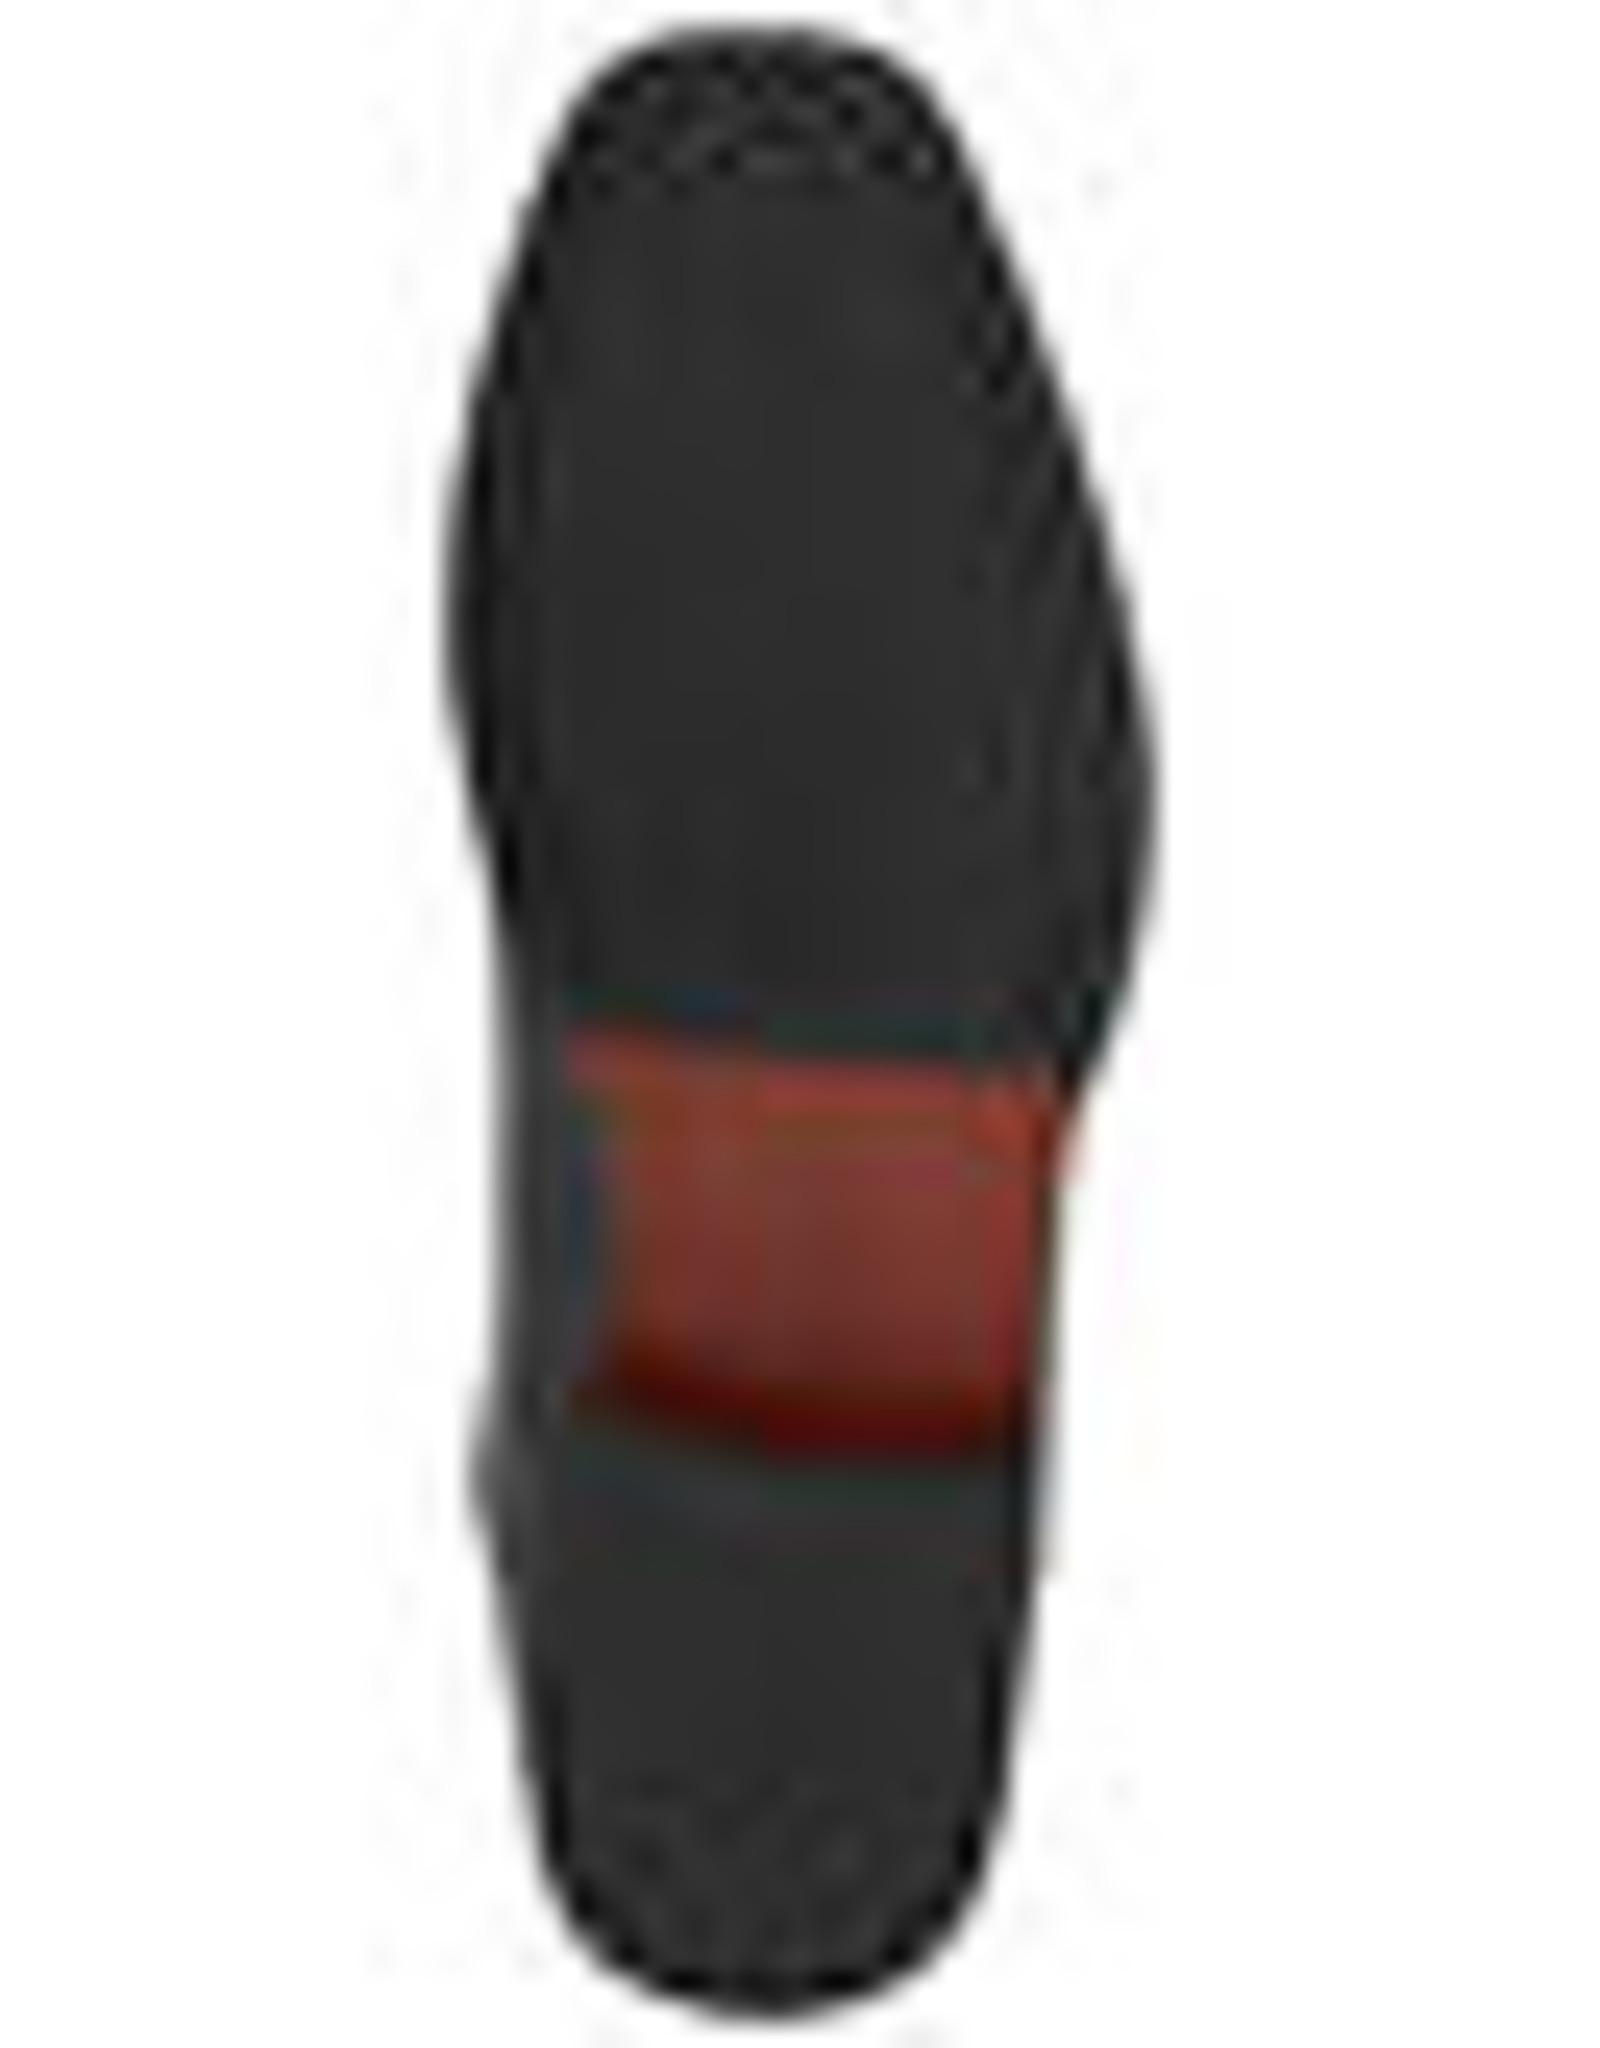 Ariat Monaco Stretch Zip Tall Riding Boot